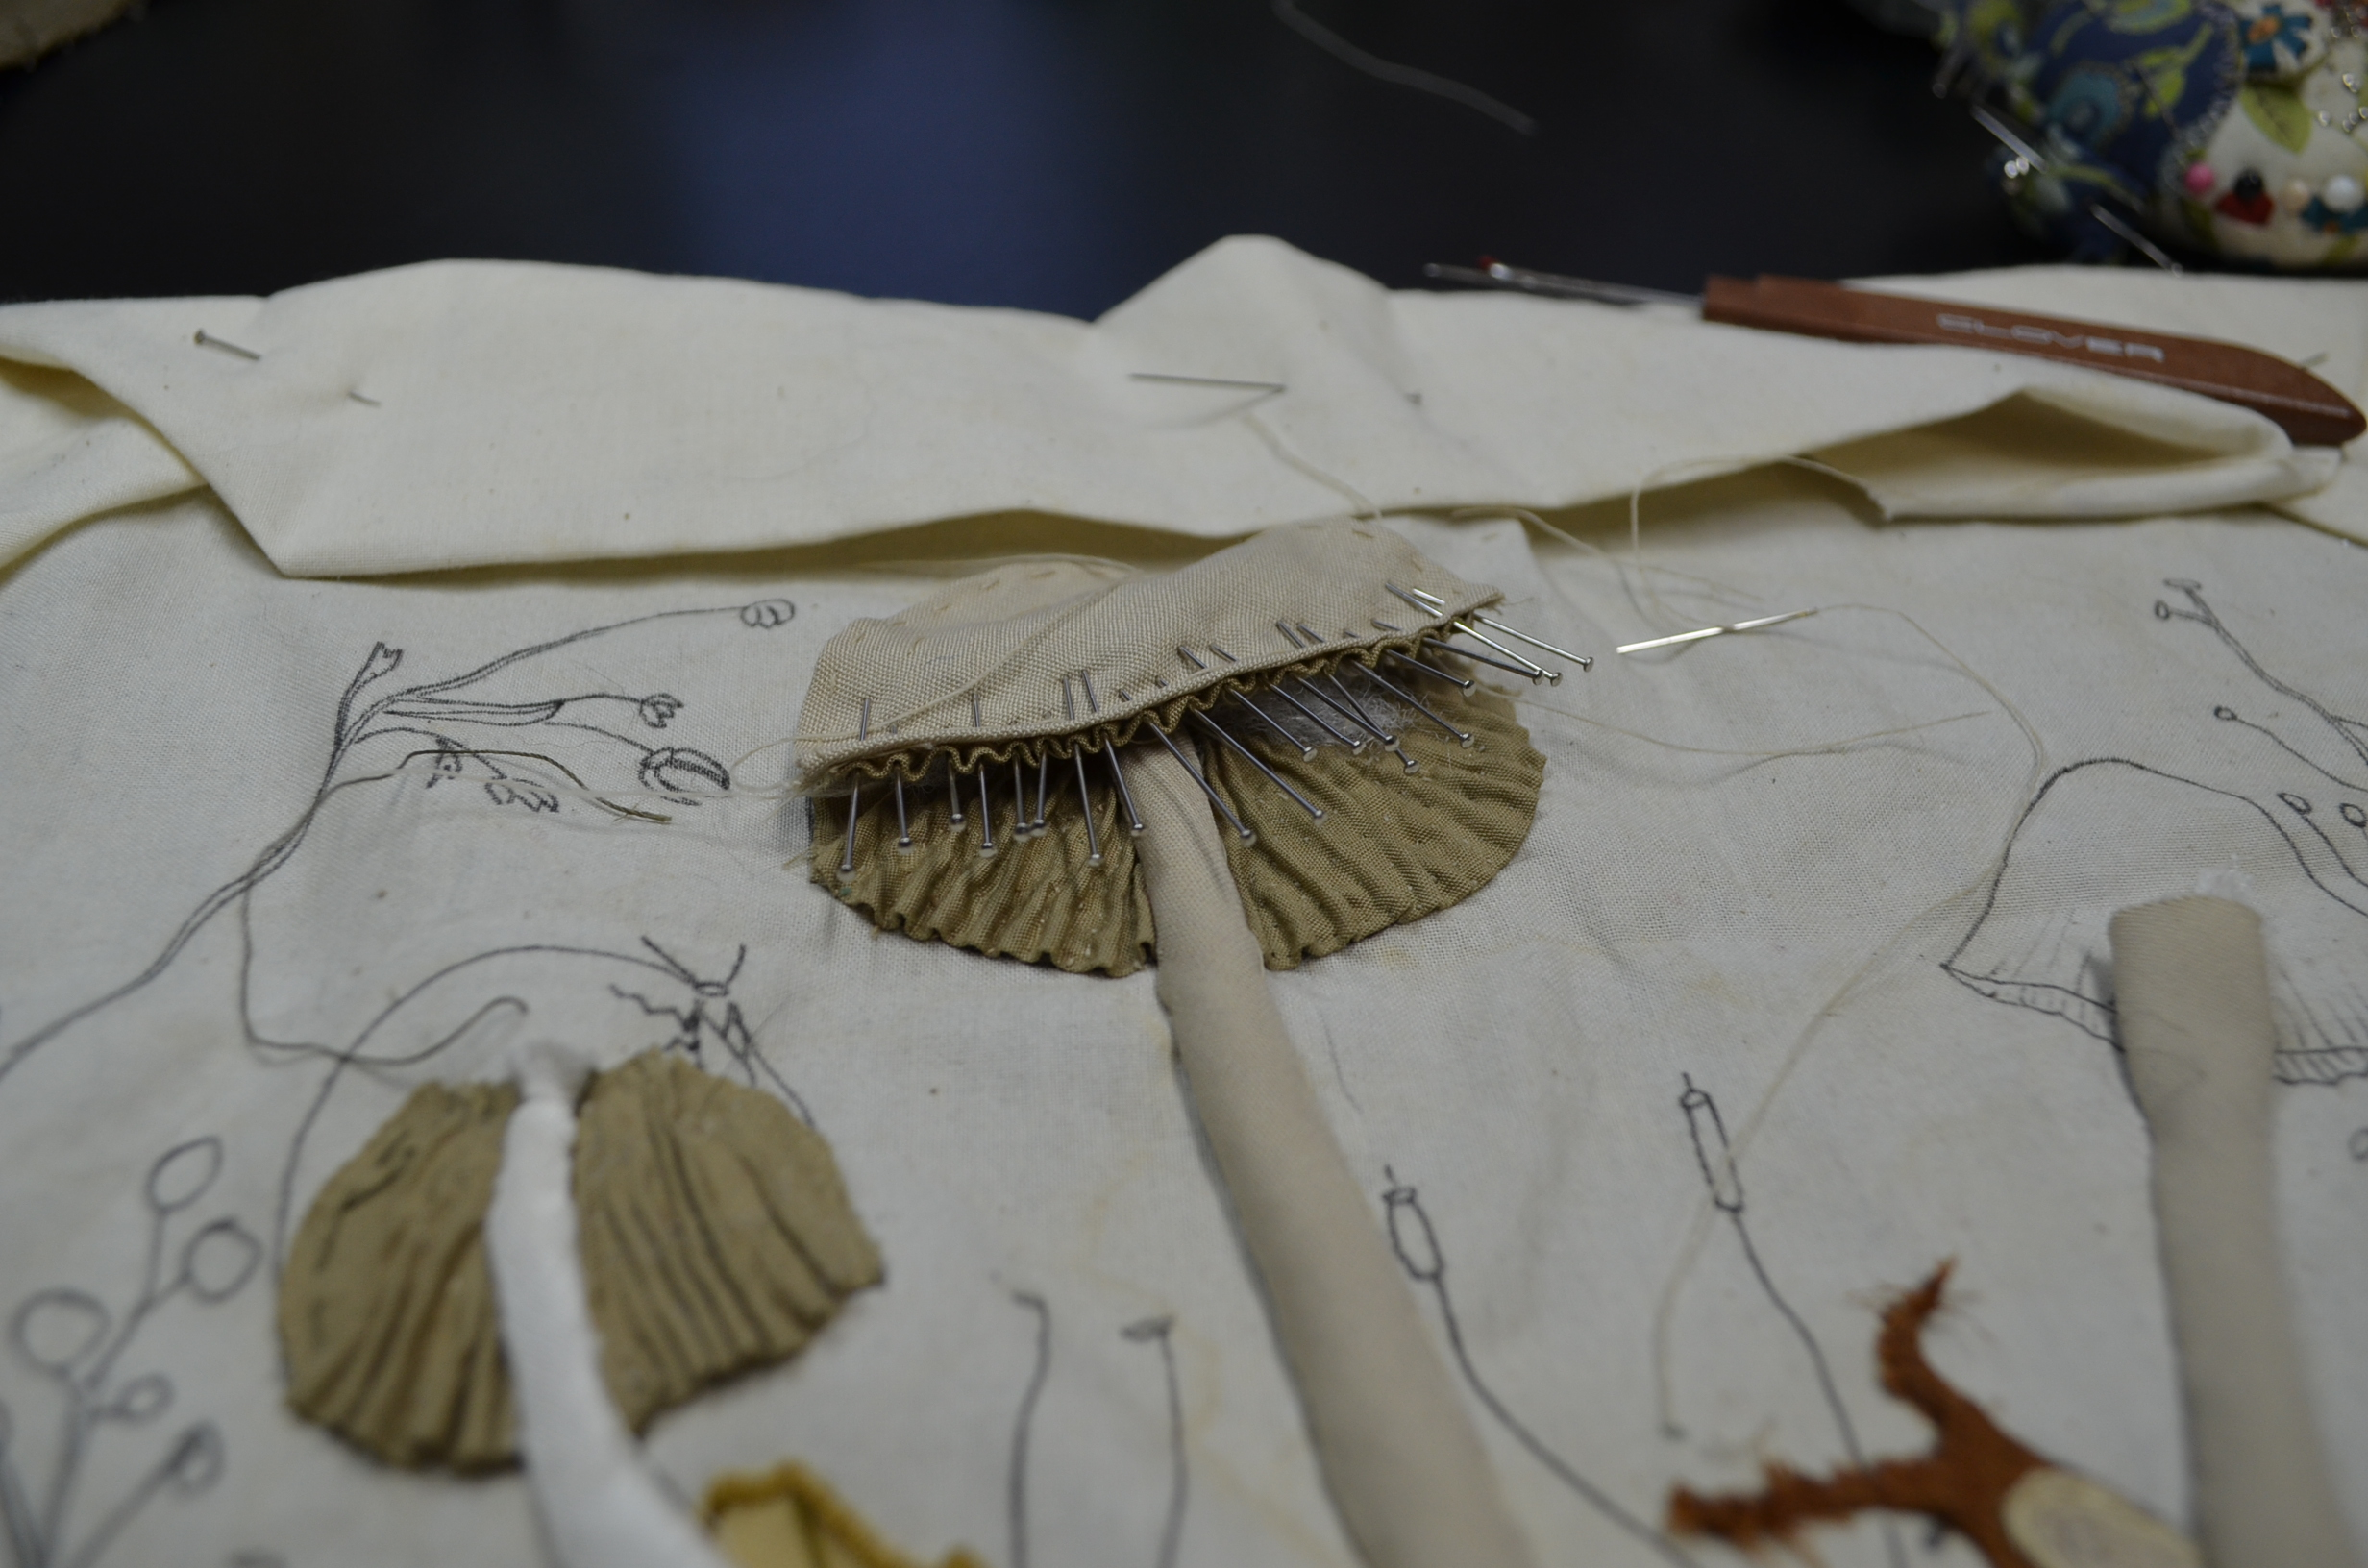 Mushroom cap gills